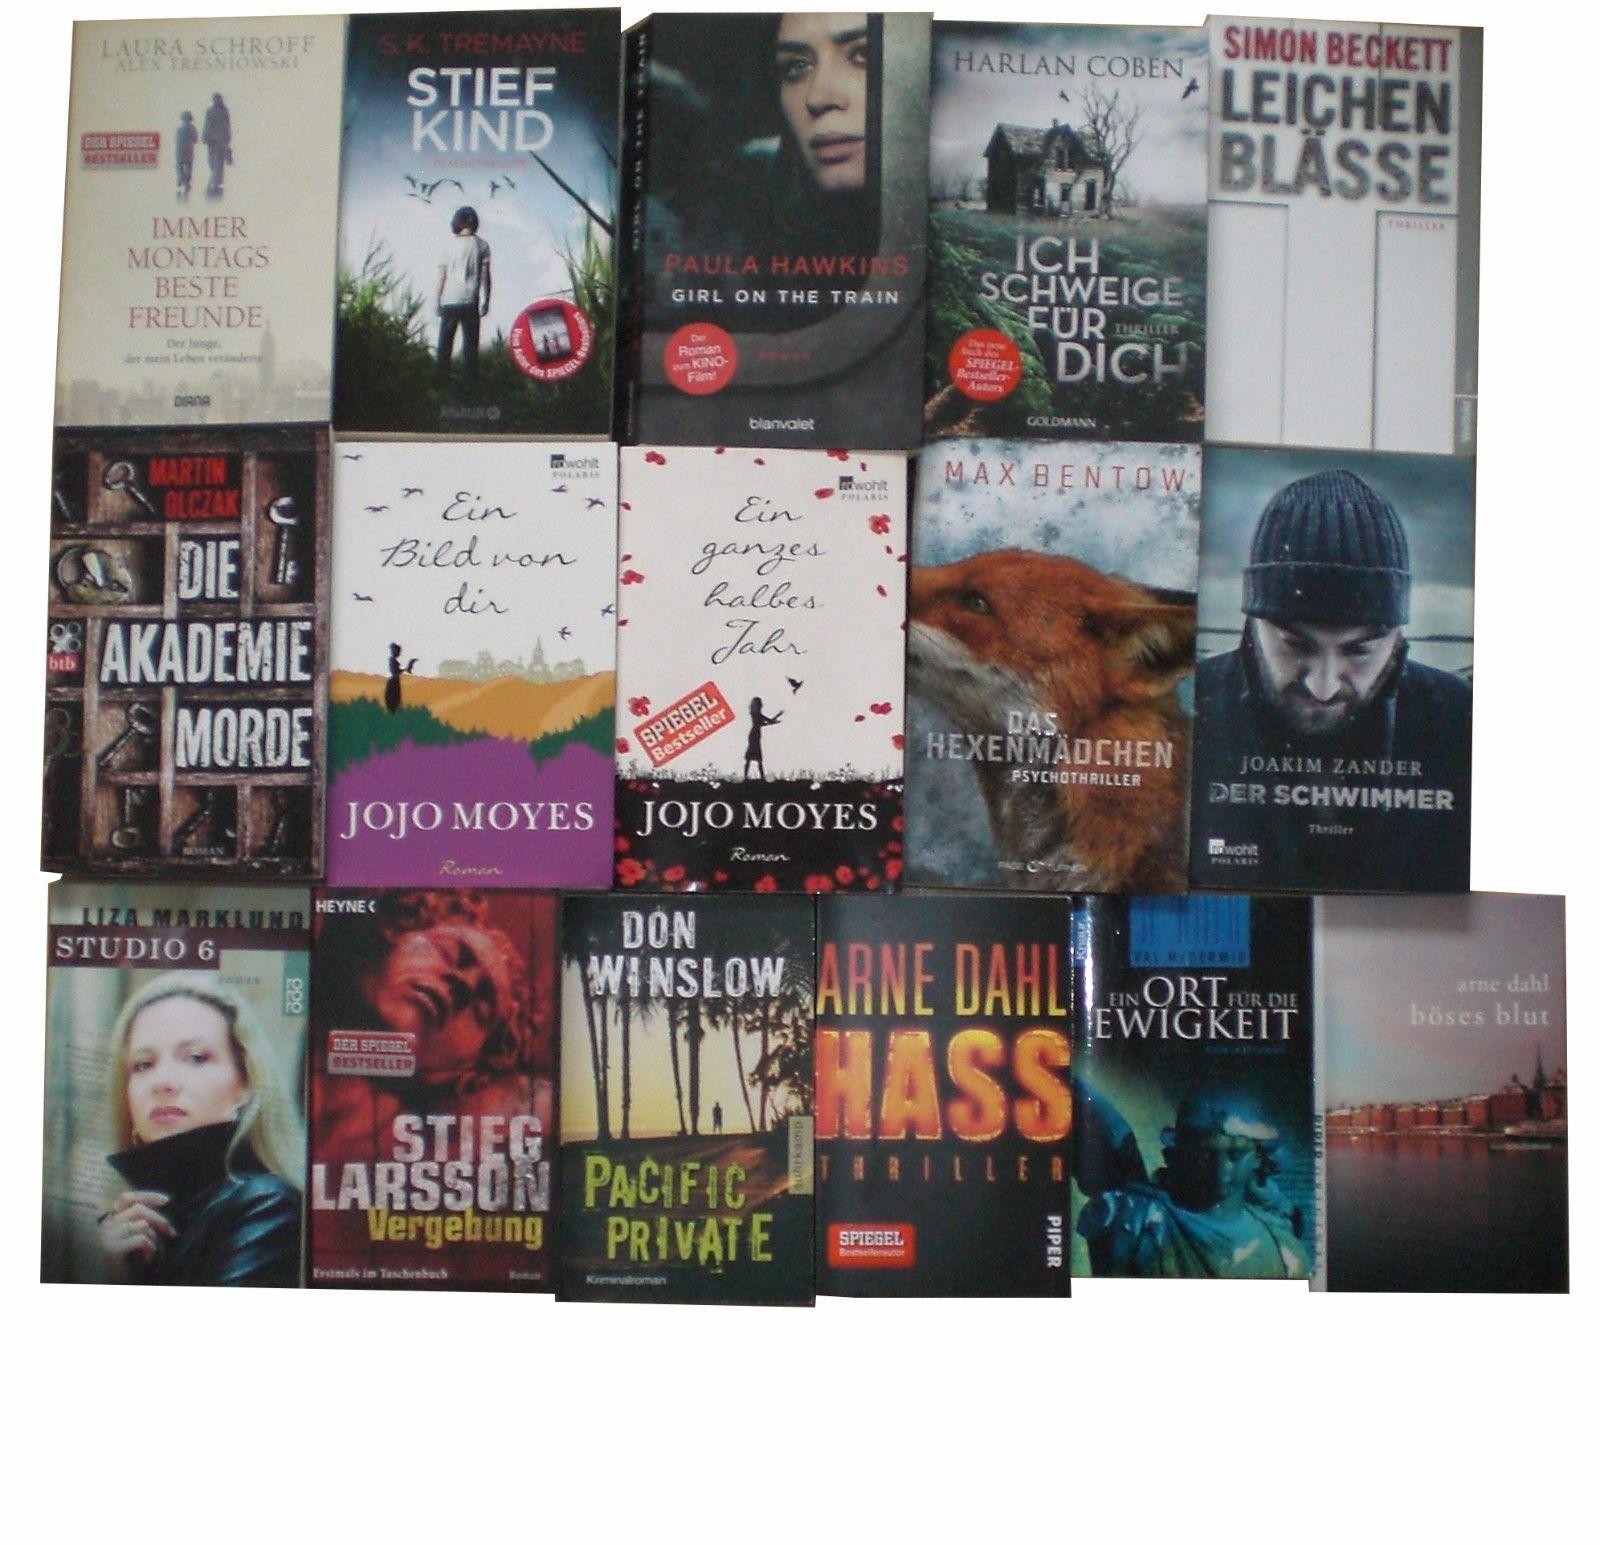 Taschenbücher, 16 Stück- SIMON BECKETT / JOJO MOYES / ARNE DAHL / J. ZANDER